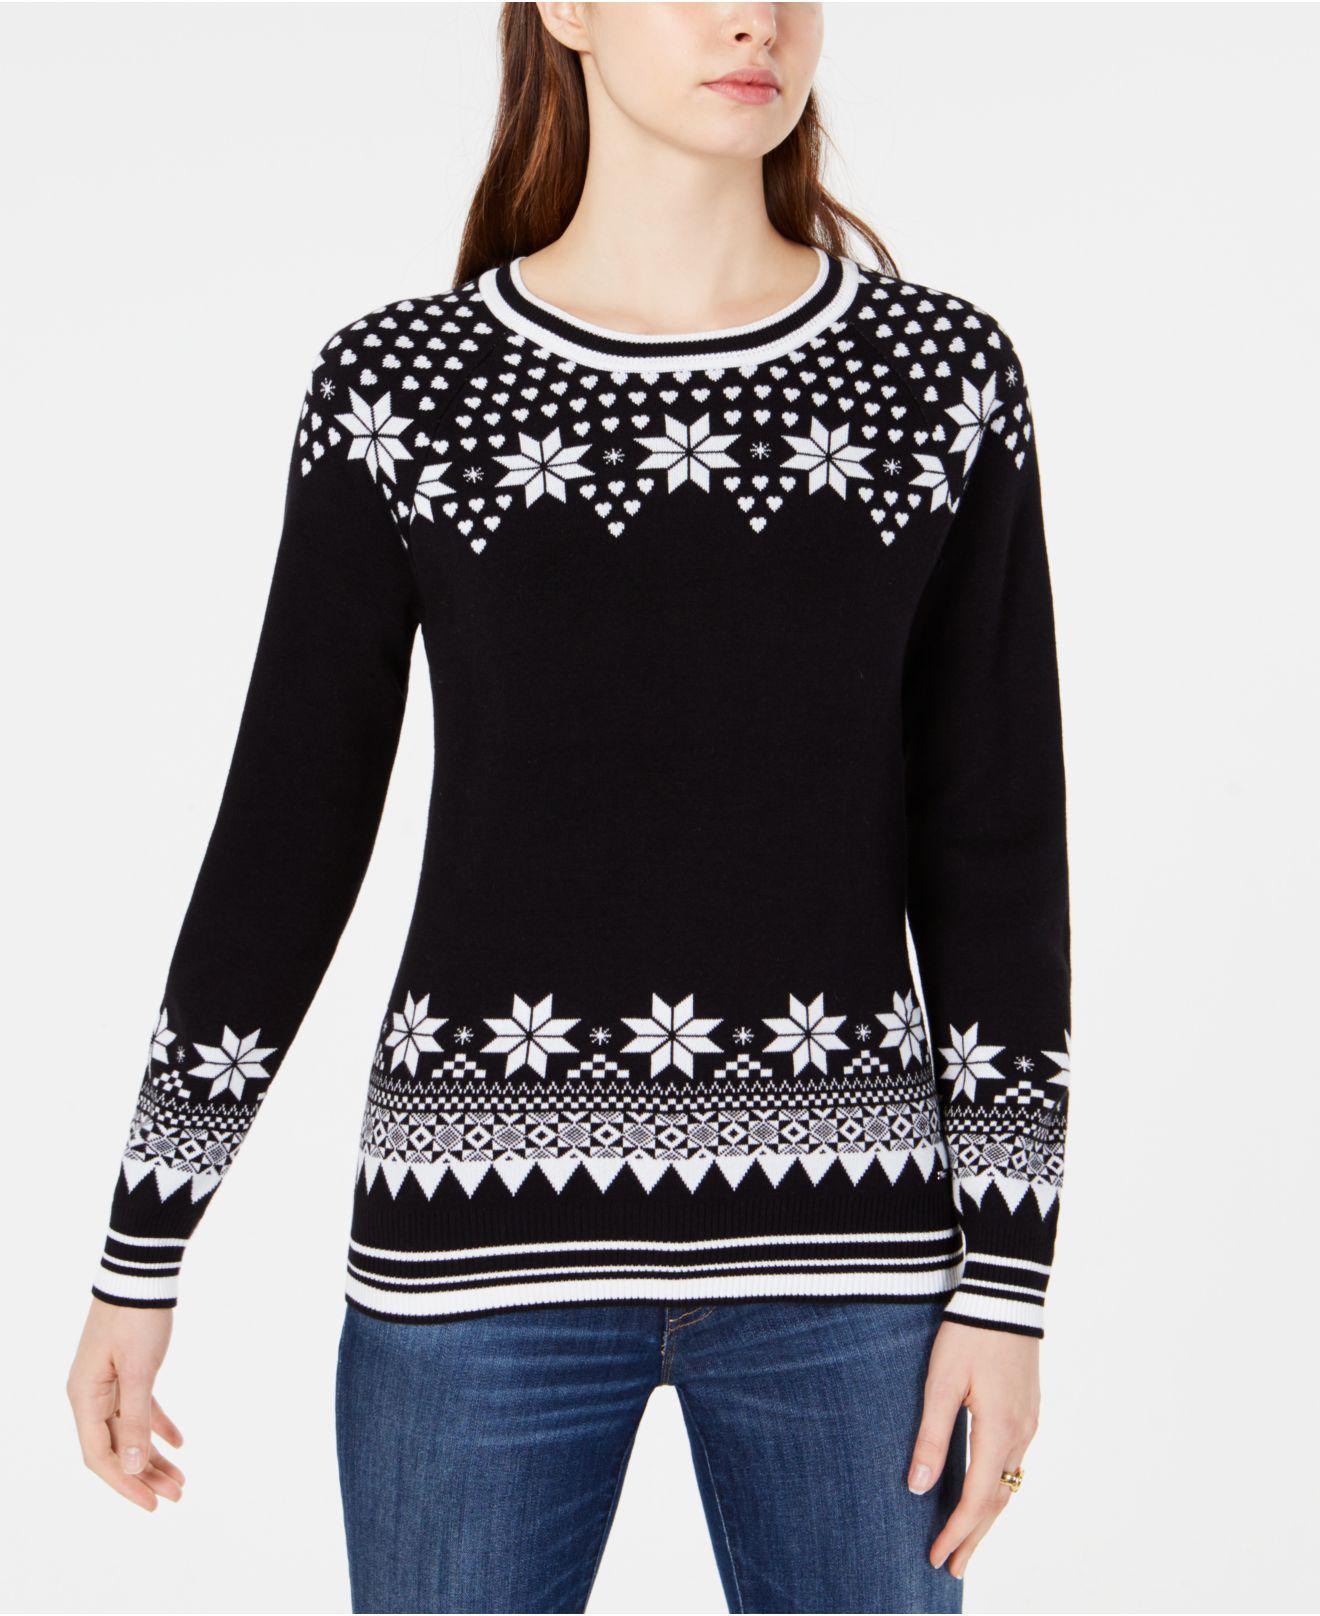 89ccb91074a Tommy Hilfiger. Women s Black Cotton Fair Isle Sweater ...